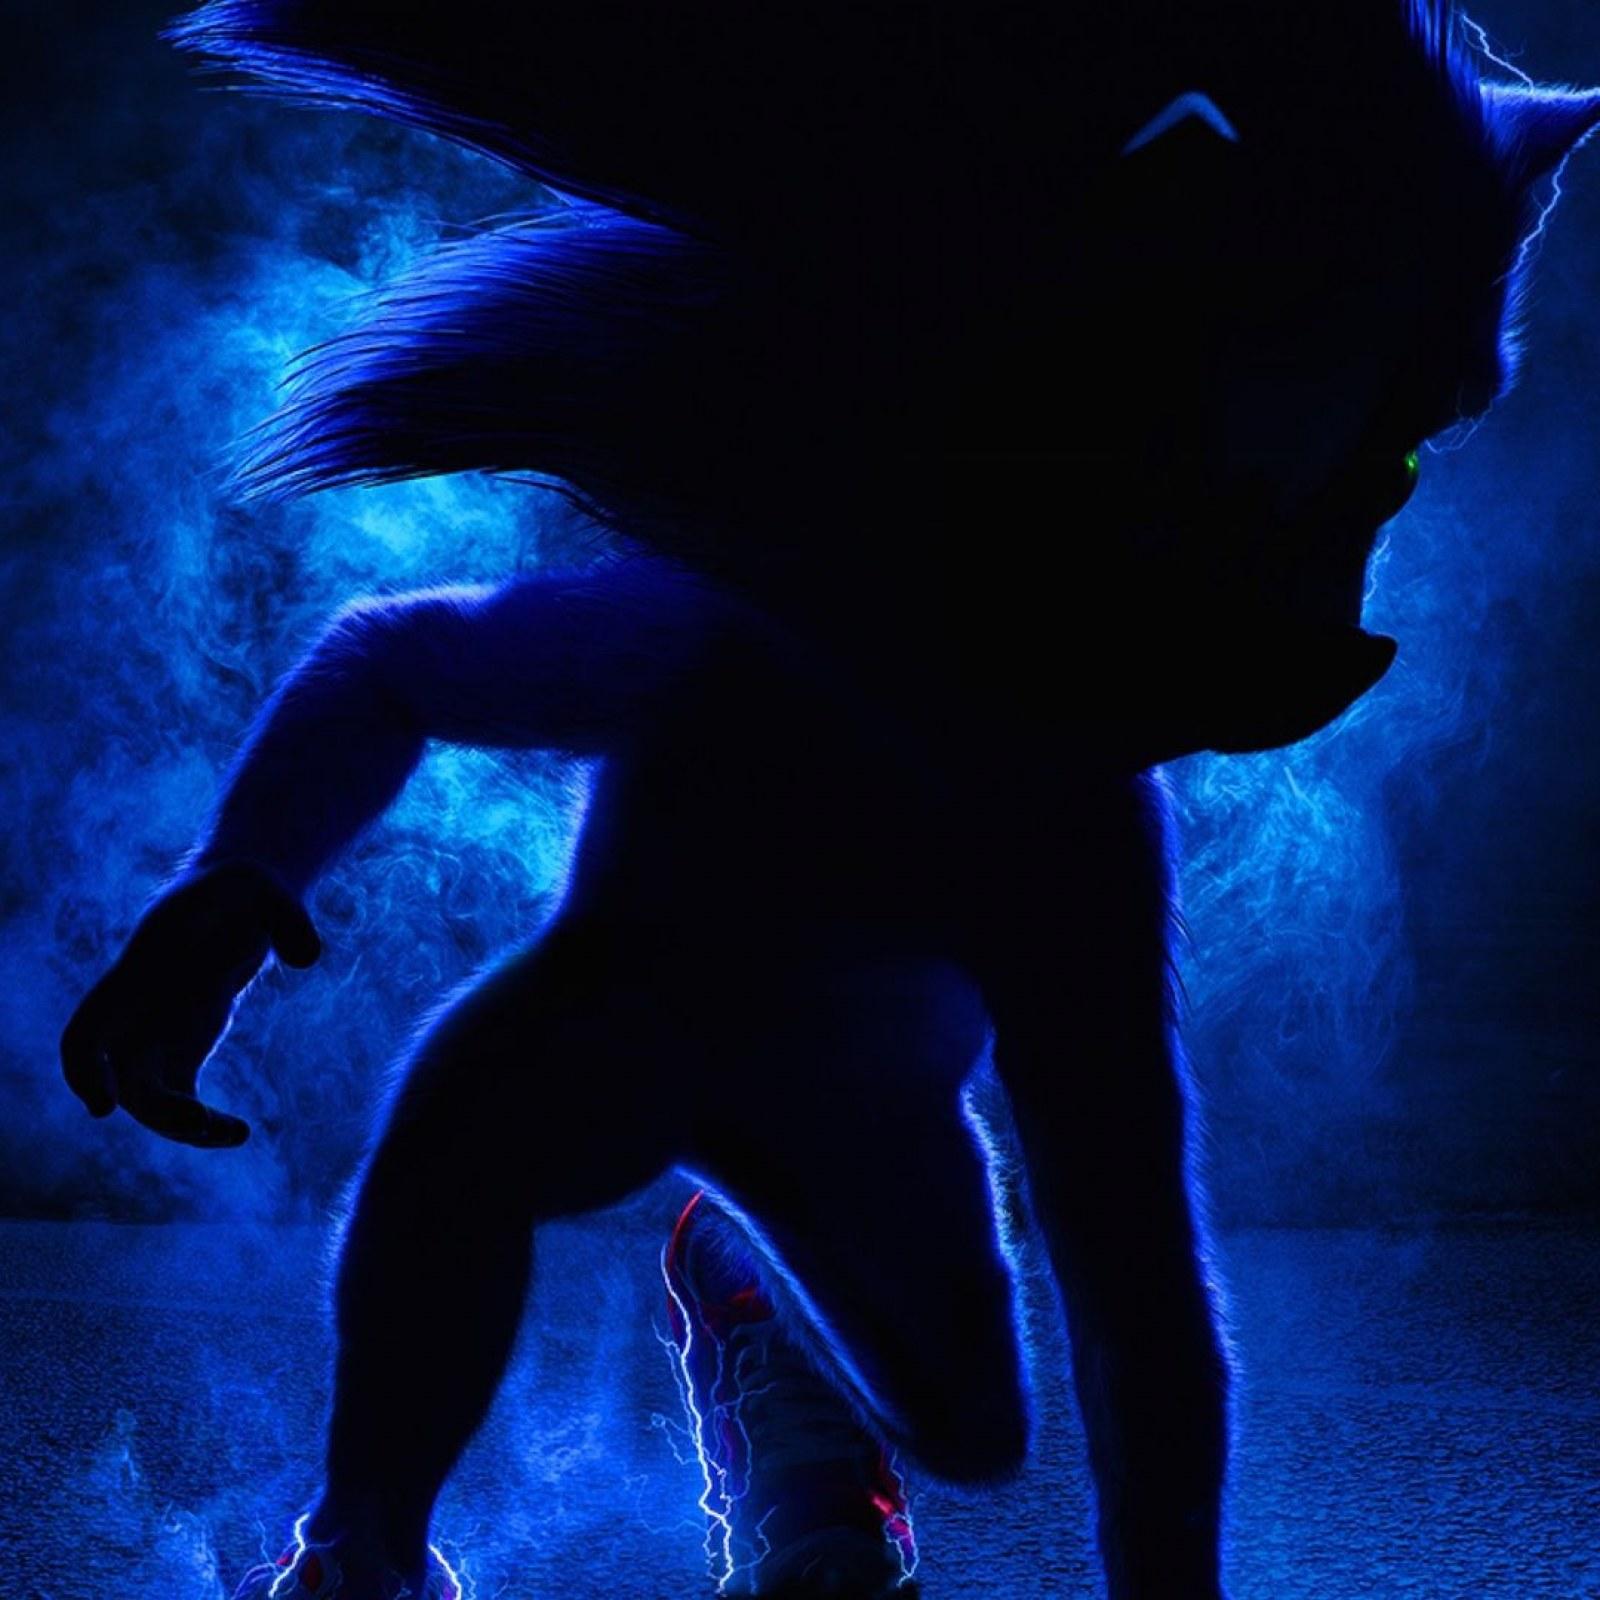 Leaked Sonic The Hedgehog Movie Cast Wish List Pairs Chris Pratt With Chris Pratt